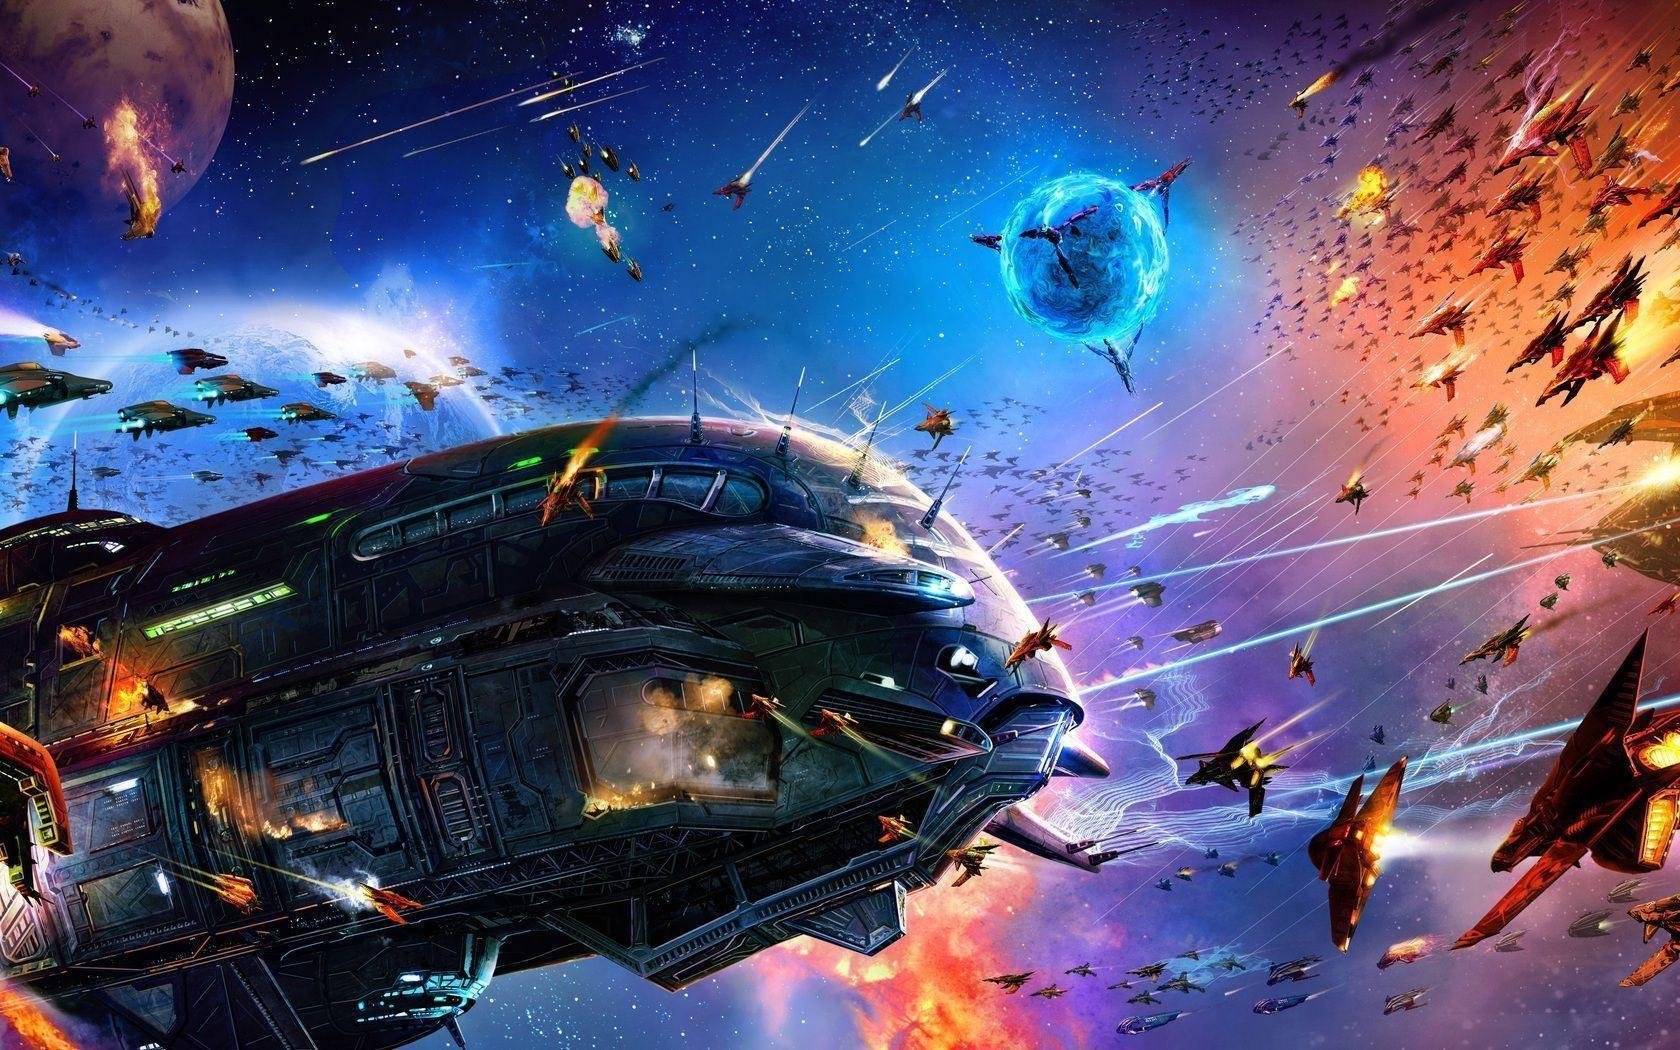 Sci Fi Spaceship Wallpaper 1680x1050 px Free Download ...